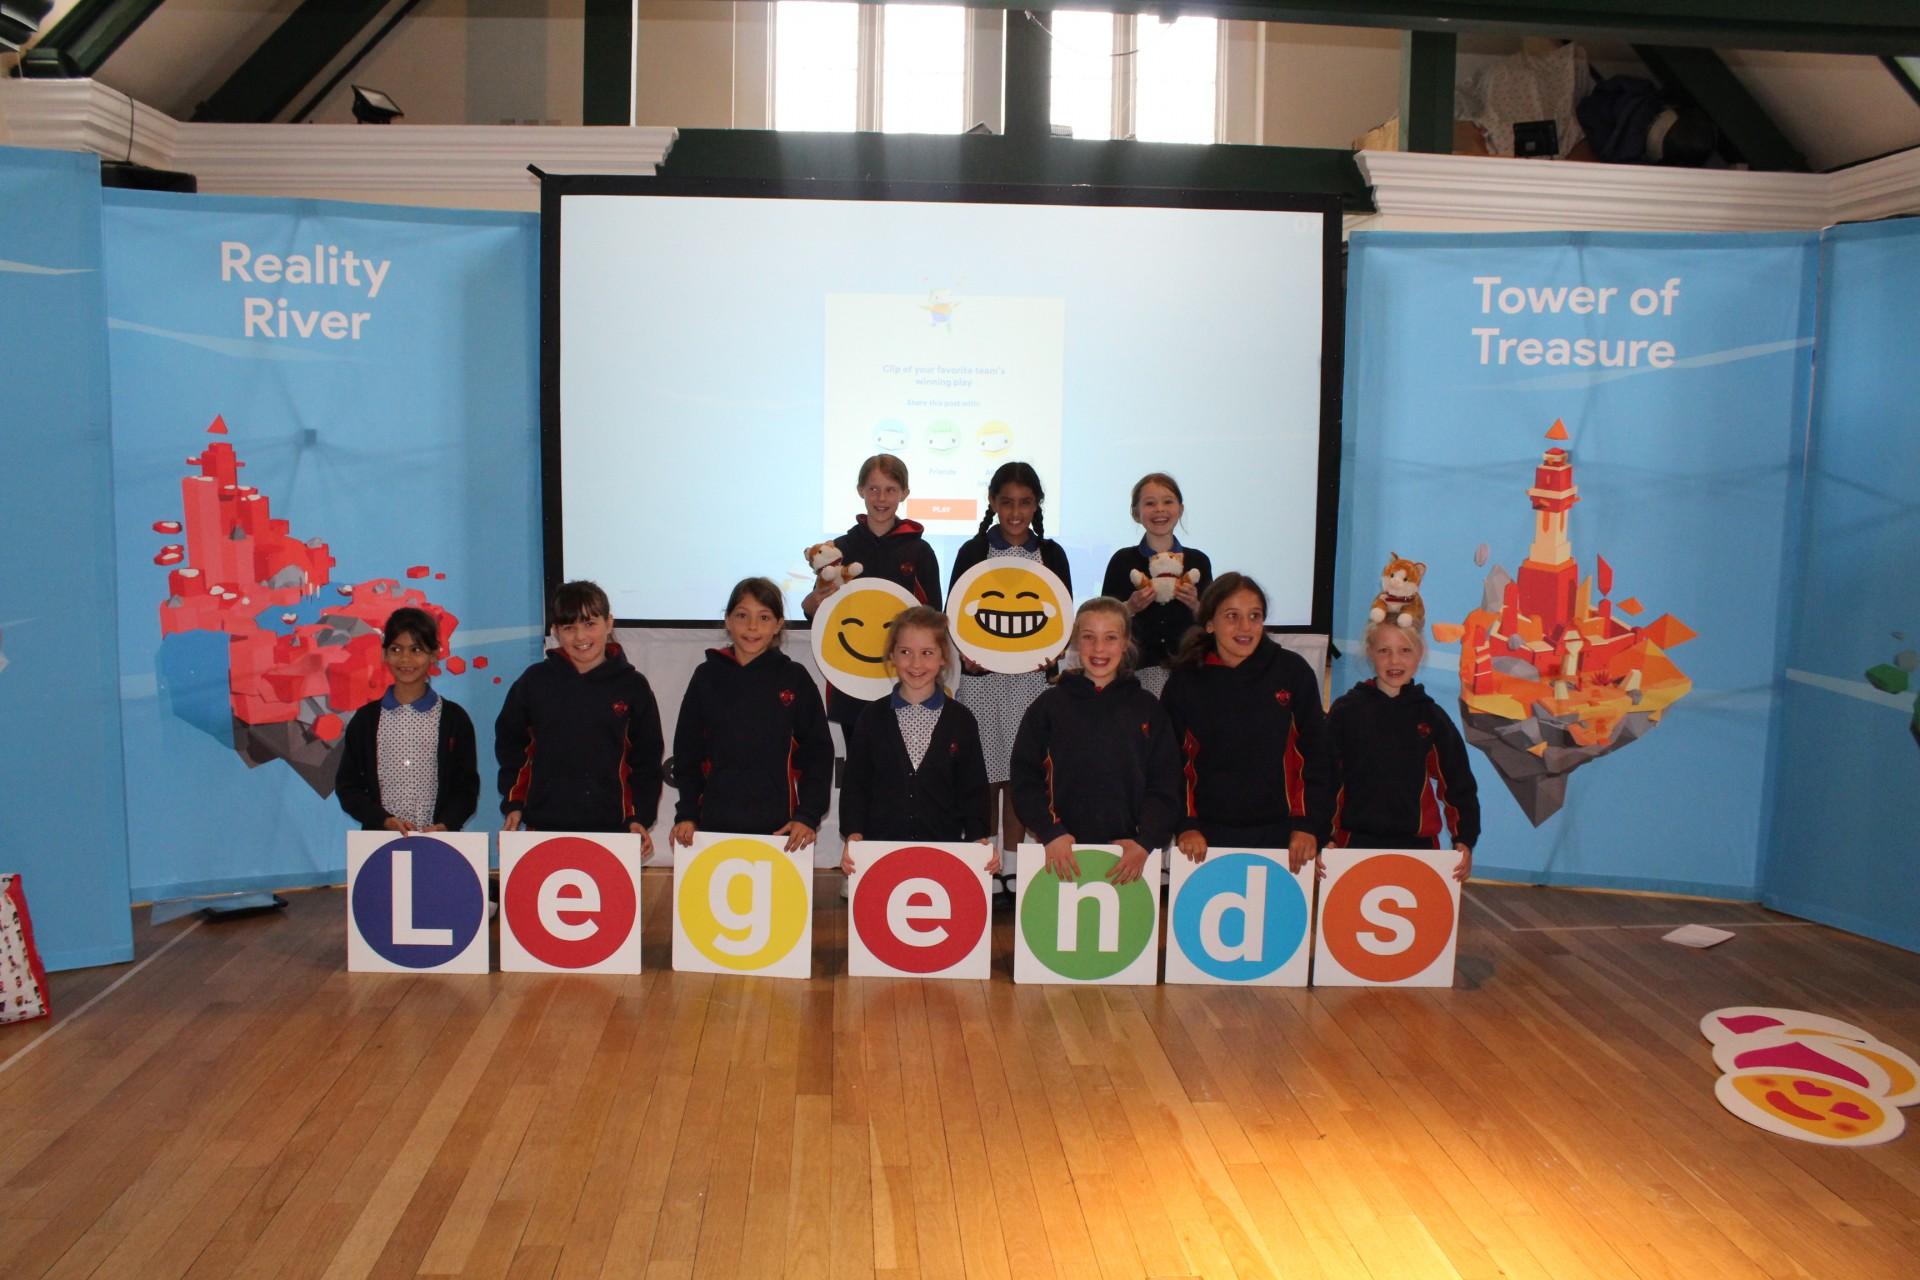 'Internet Legends' Assembly Hosted by Google